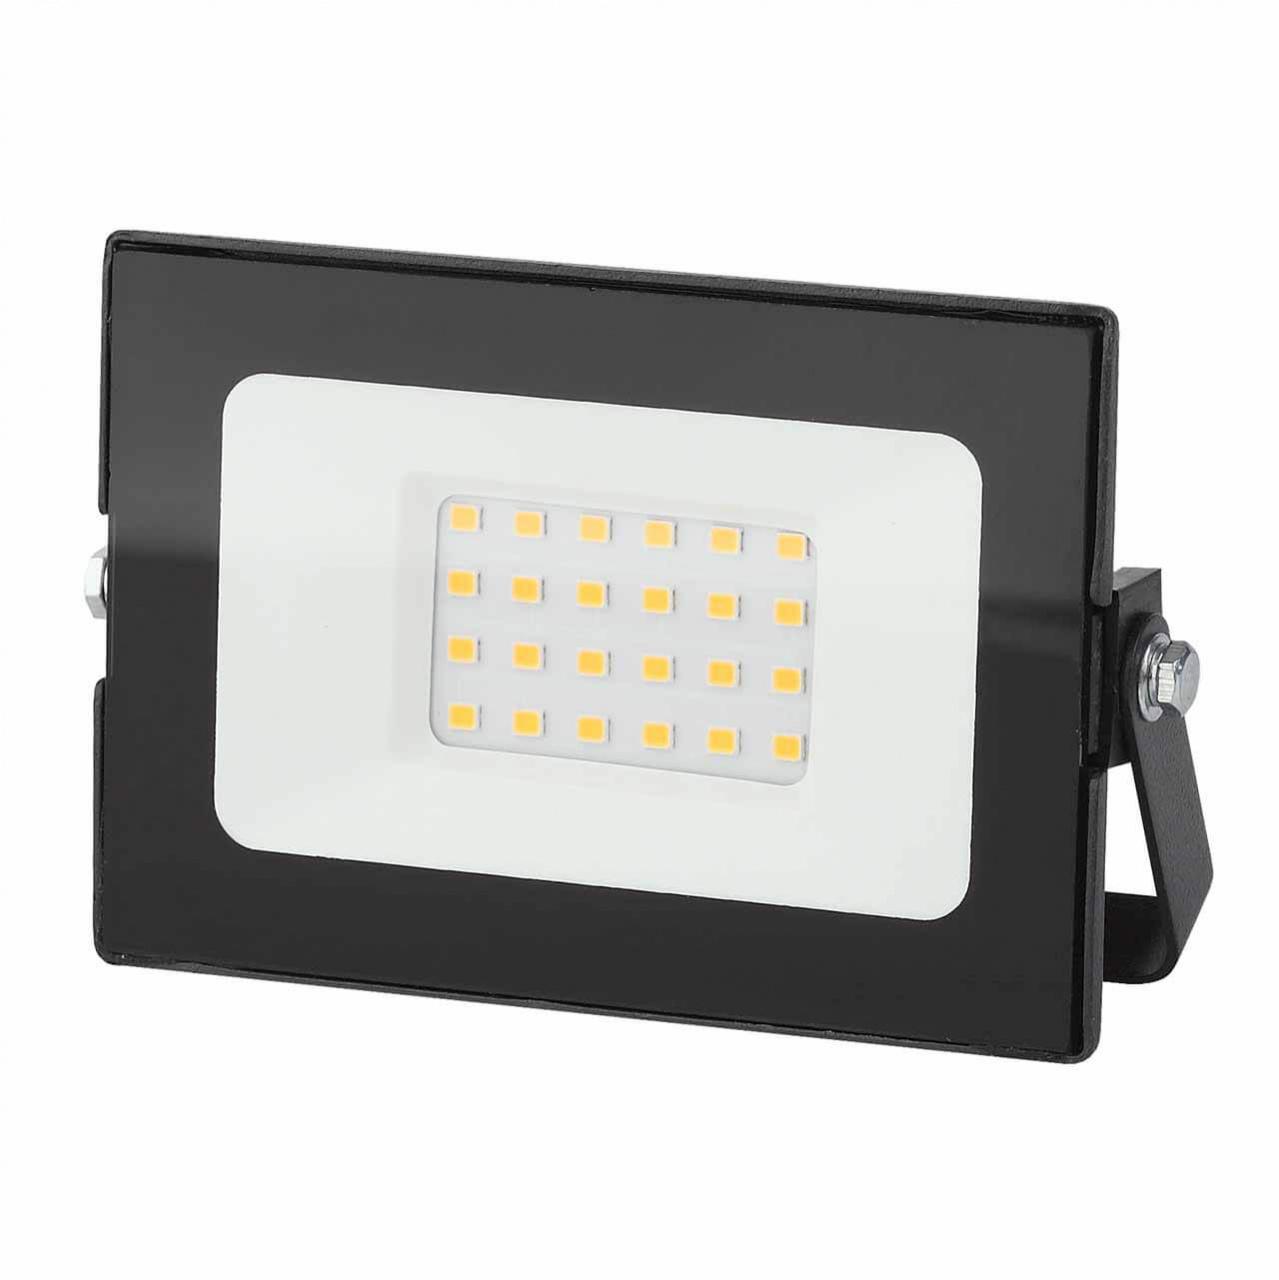 Прожектор ЭРА LPR-021-0-40K-020 PR-021